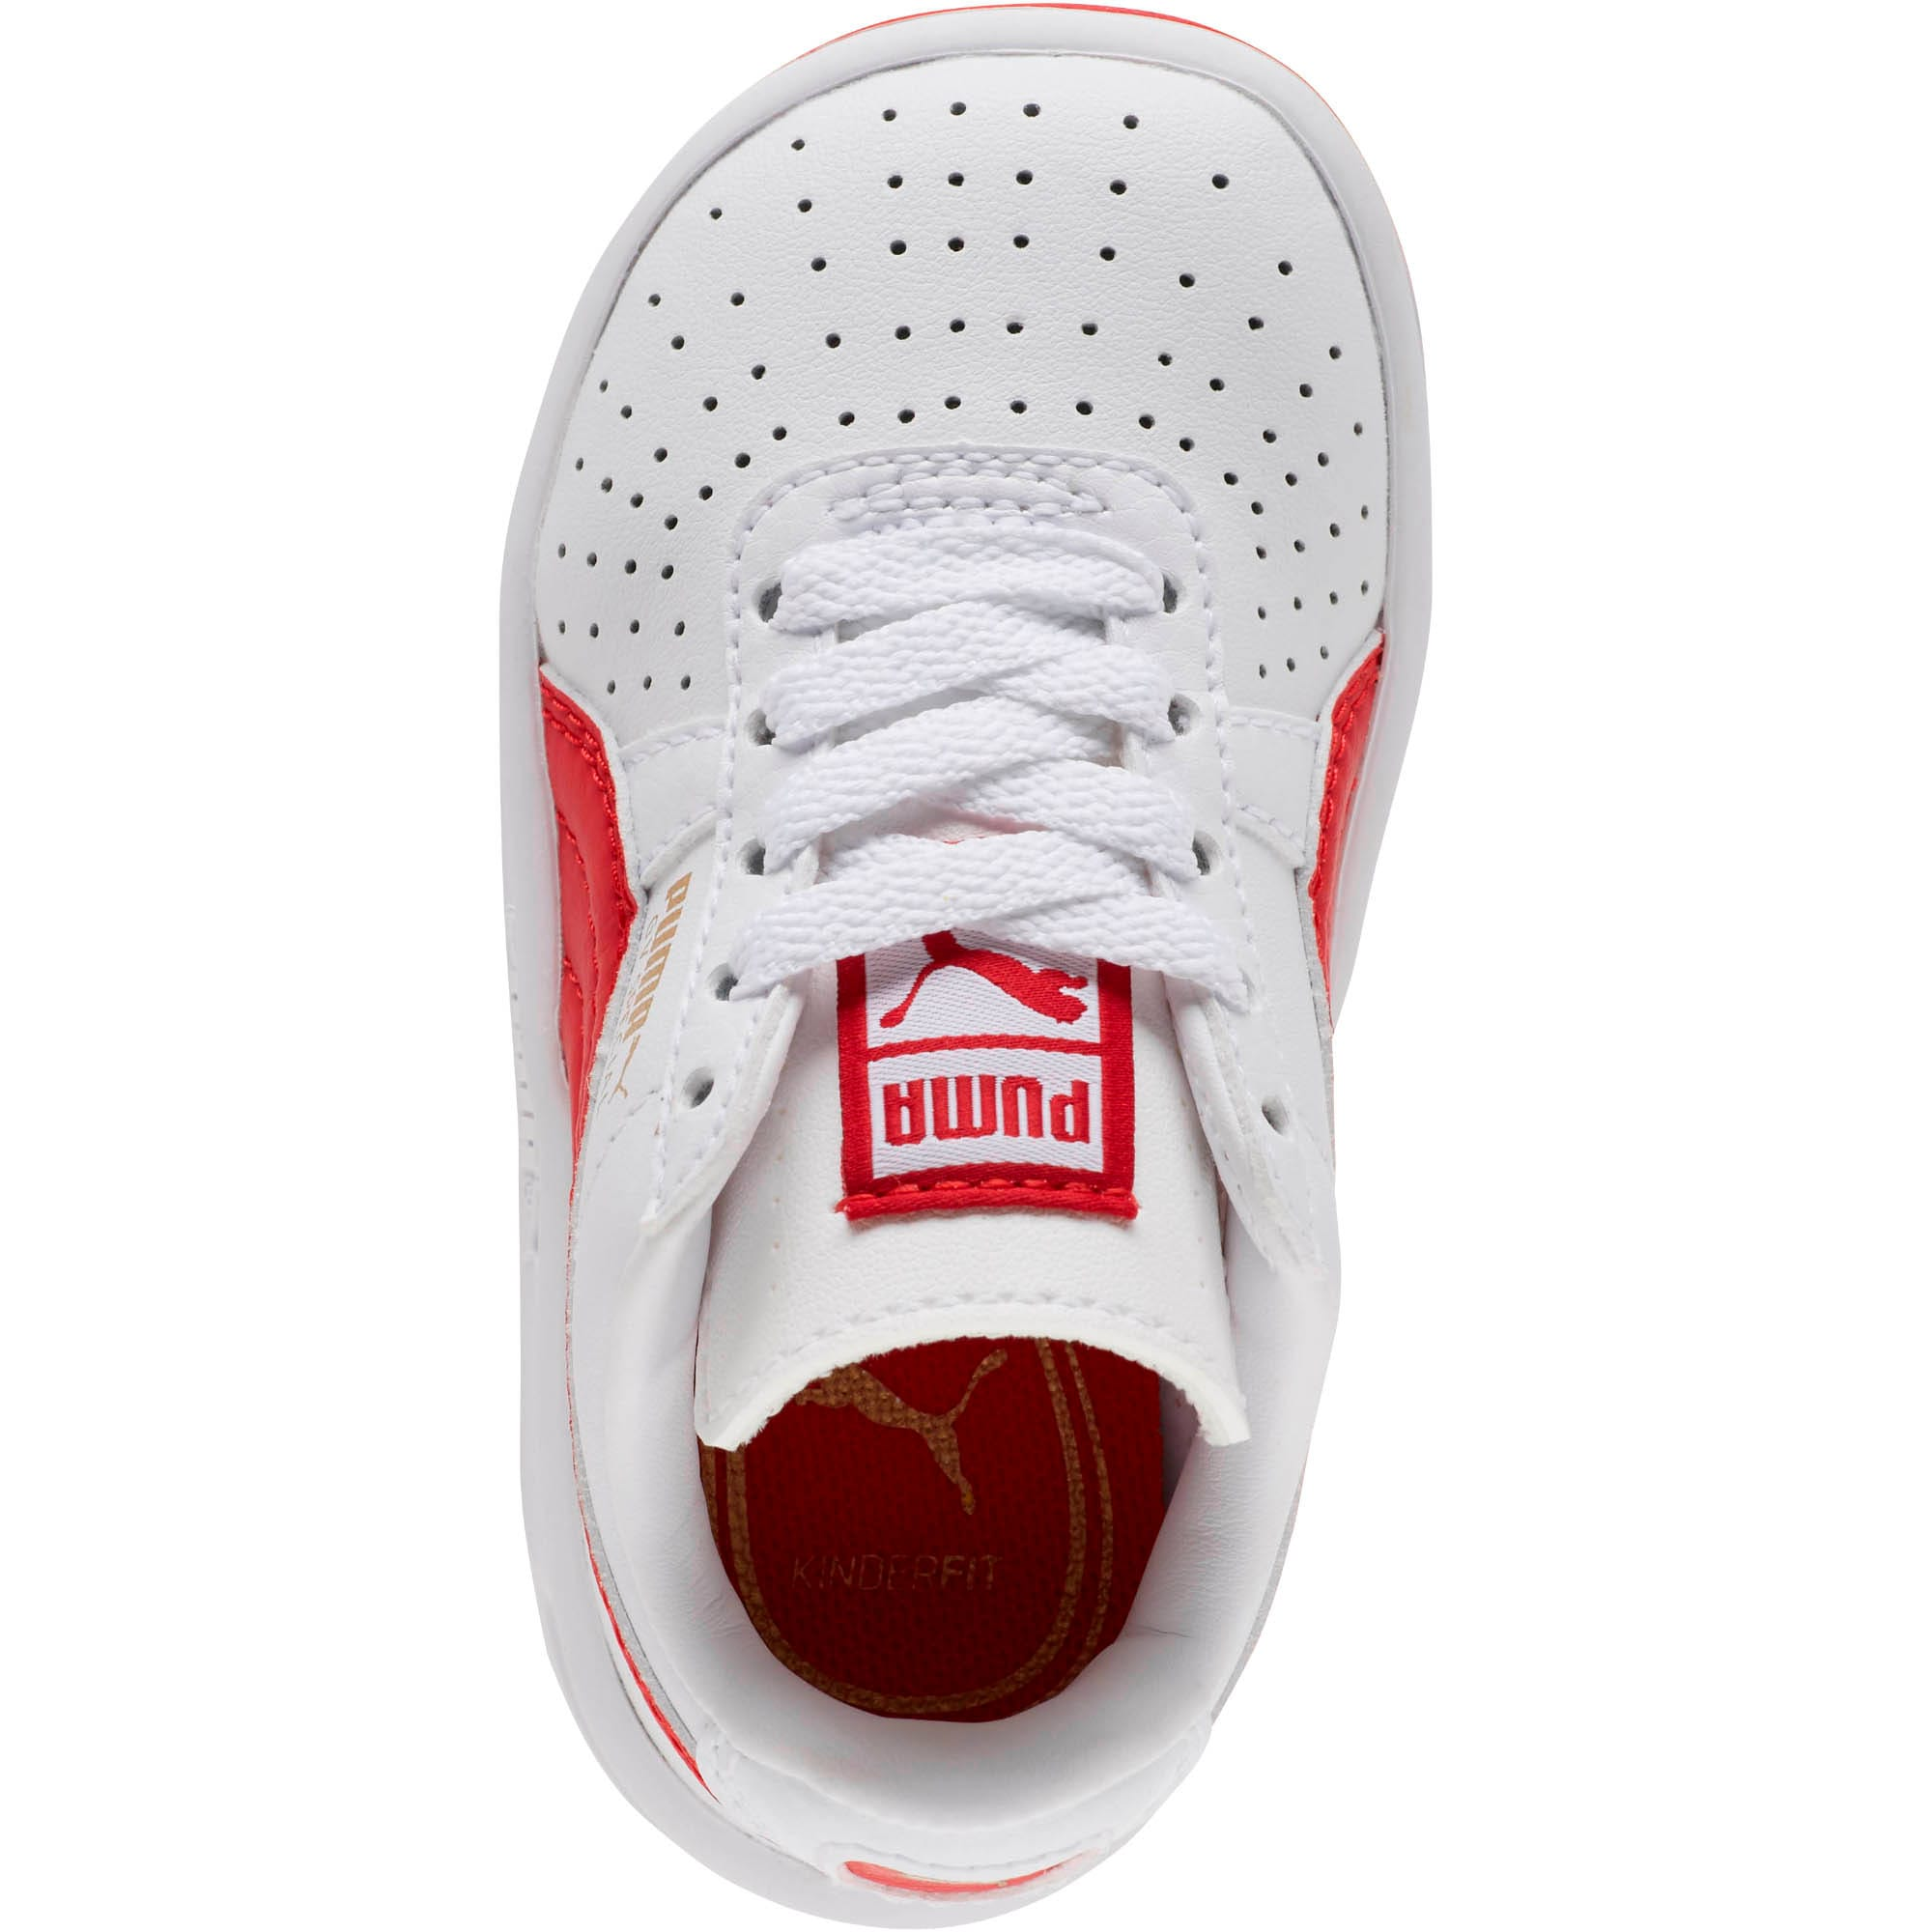 Thumbnail 5 of GV Special Toddler Shoes, Puma White-Ribbon Red, medium